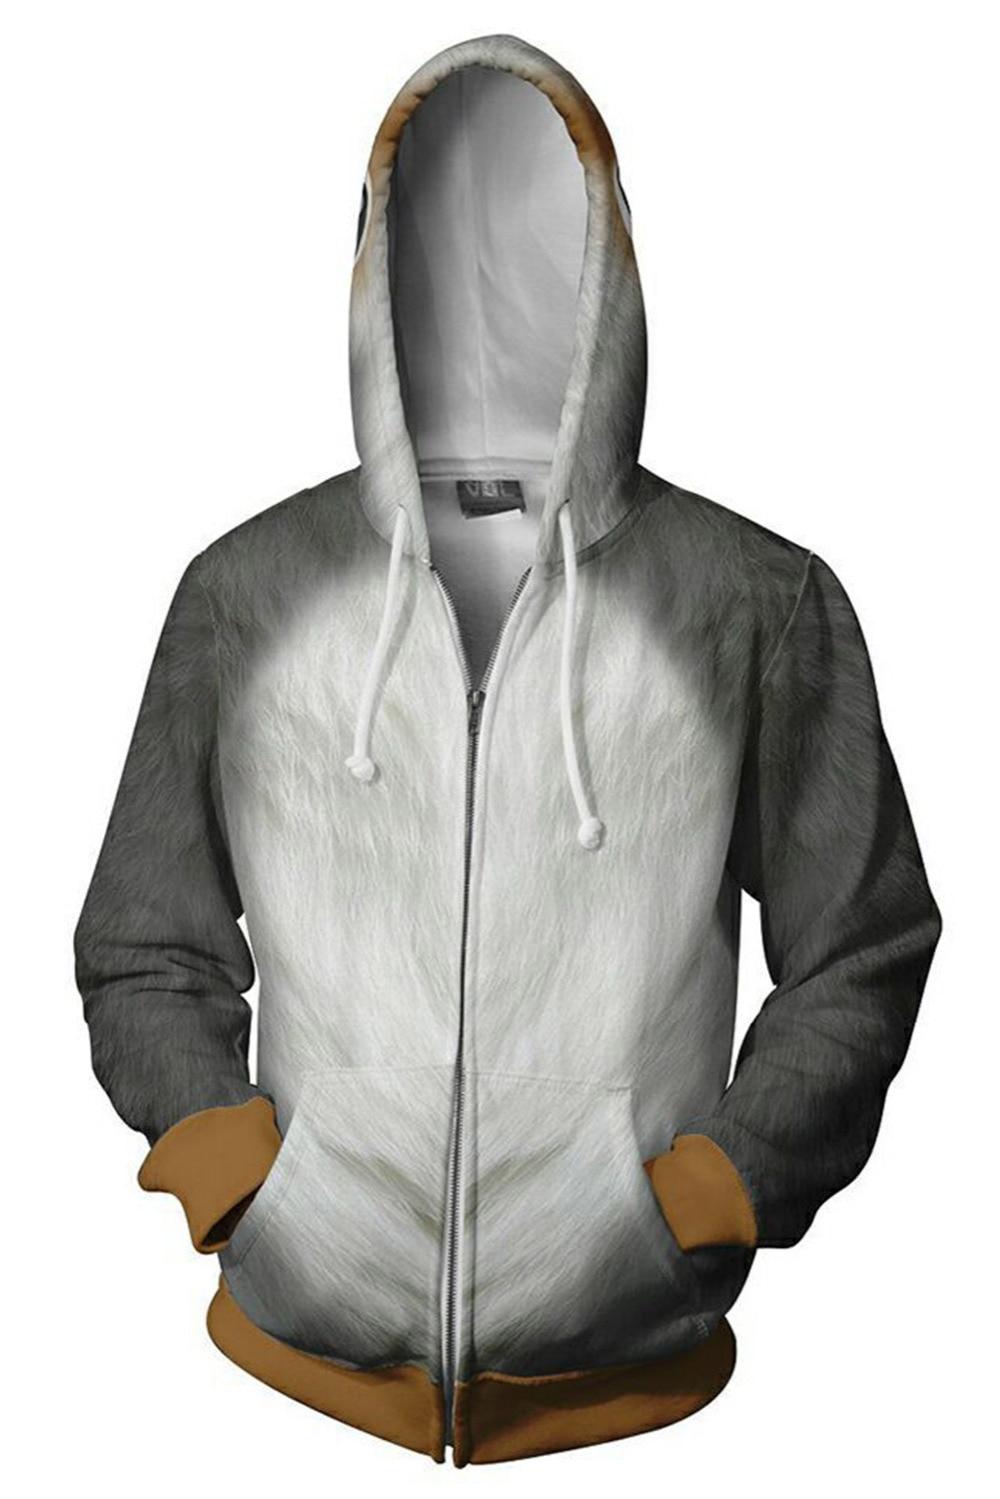 Star Wars Porg Hoodie Sweatshirt Long Sleeve Casual Plus Size Homme Autumn Winter Hoodies Men Zipper Streetwear